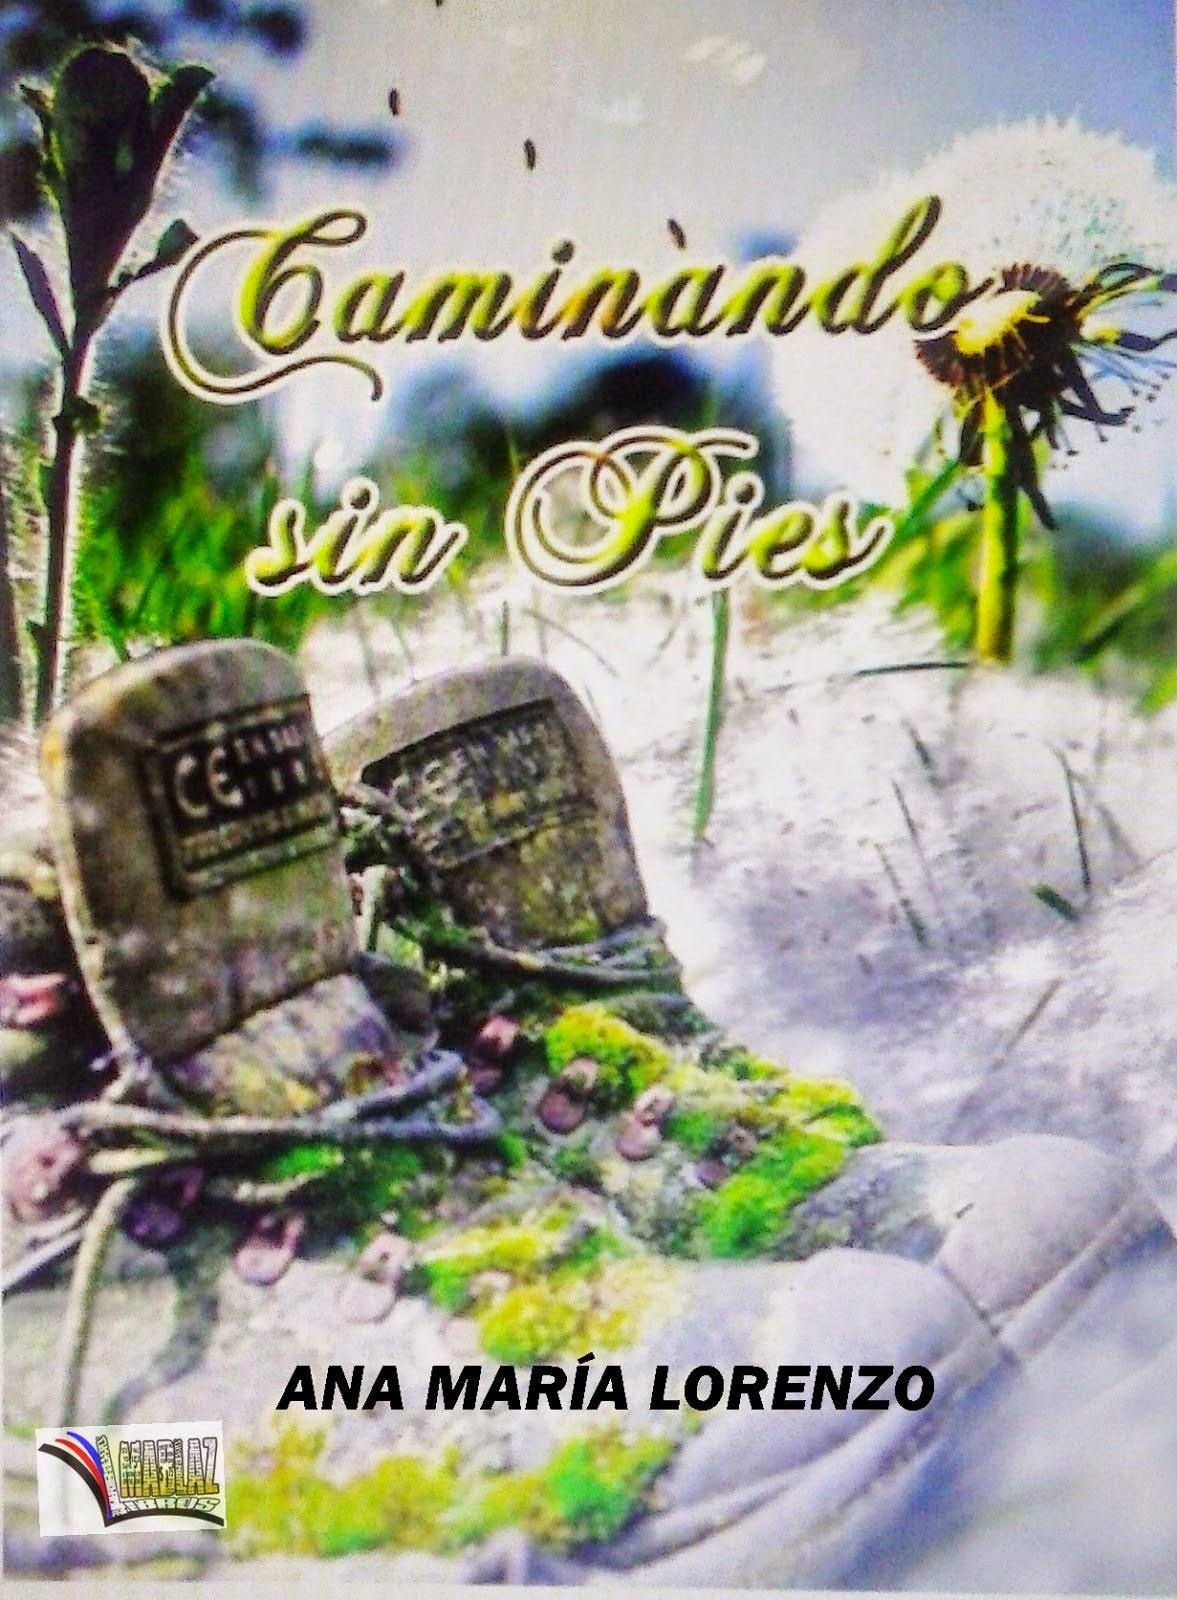 http://www.unionescritores.com/2015/02/caminando-sin-pies-libro-de-ana-maria.html